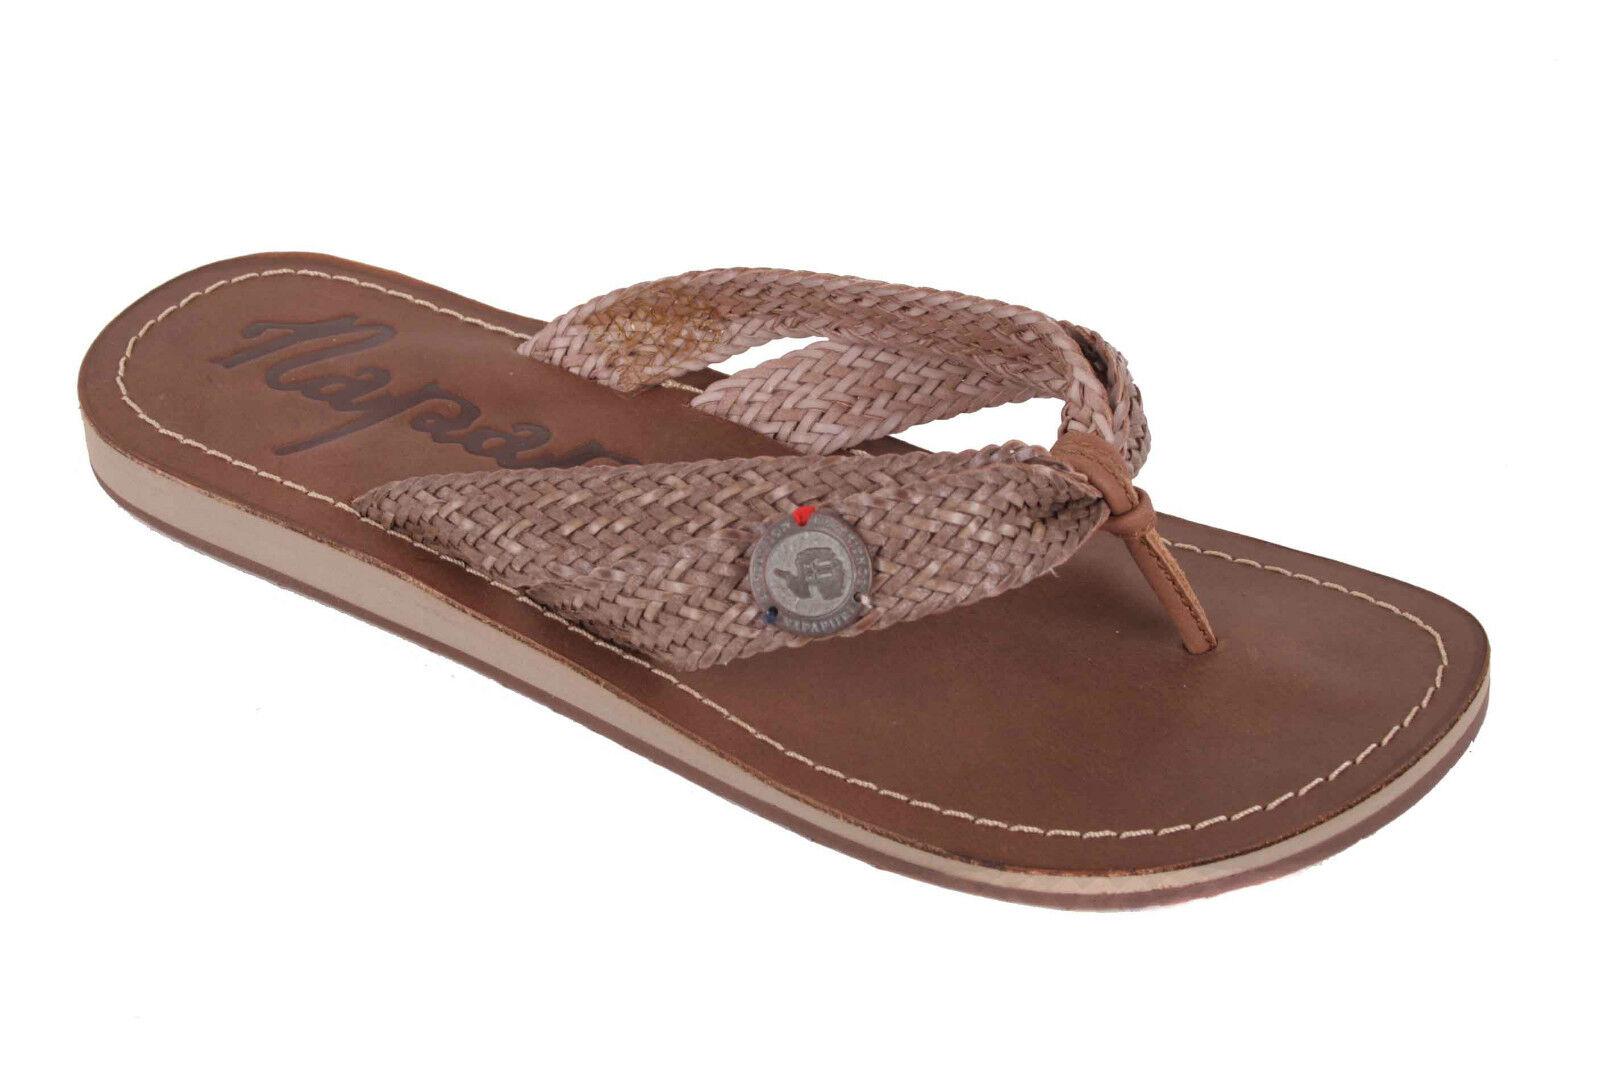 Napapijri Women's Sandals Sandals Sandals Toe Post Thongs Lele Dark Brown 9e7963